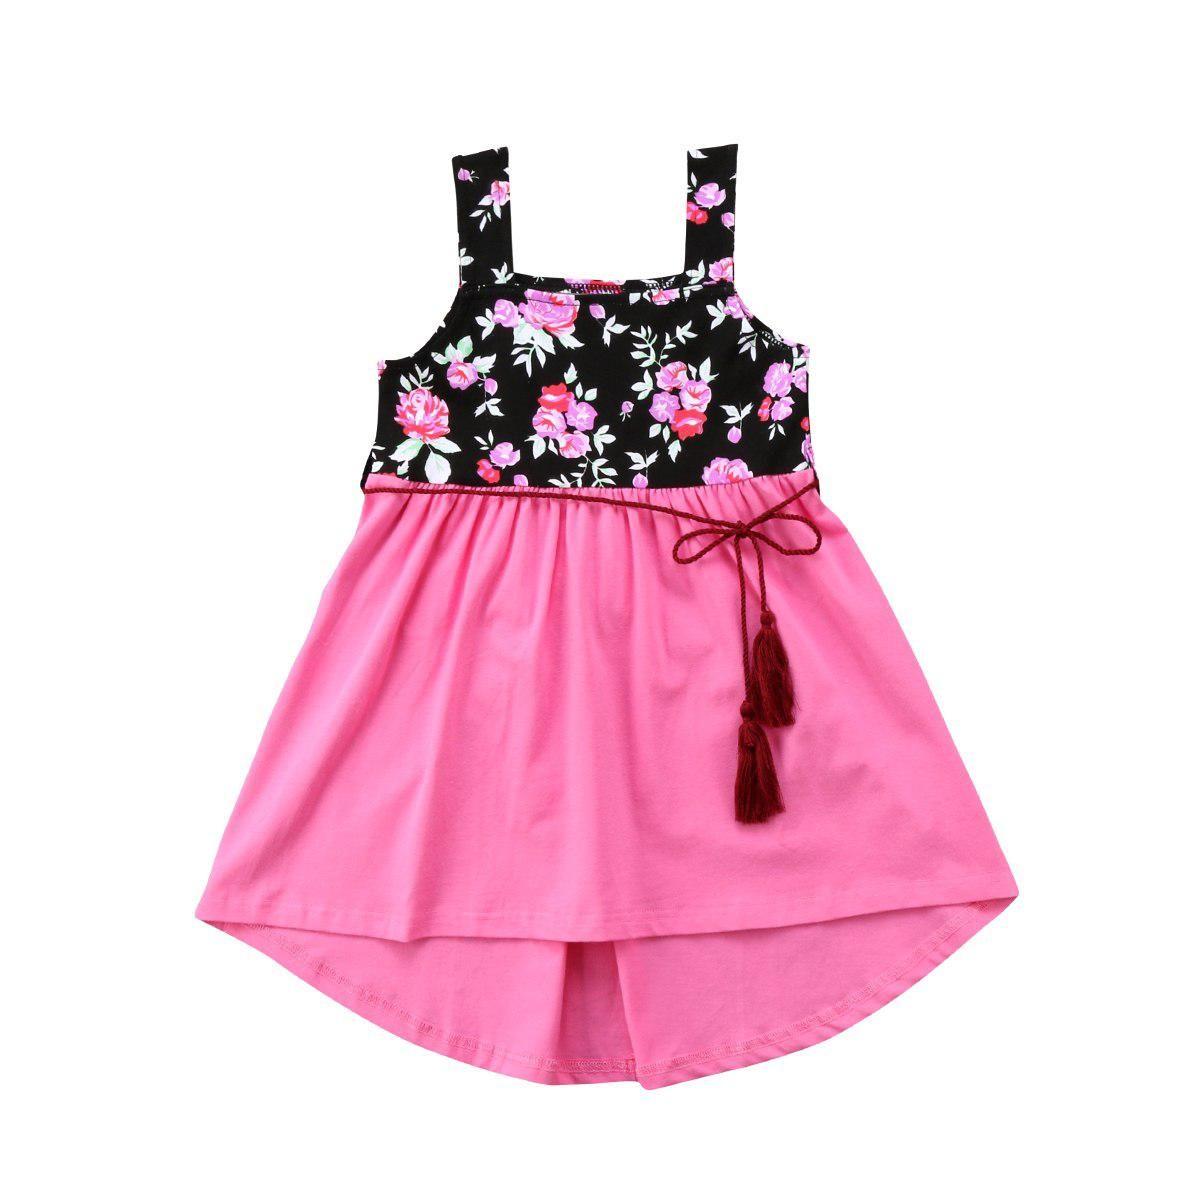 Newborn Kids Baby Girls Cotton Party Pageant Sleeveless Dress Sundress Clothes